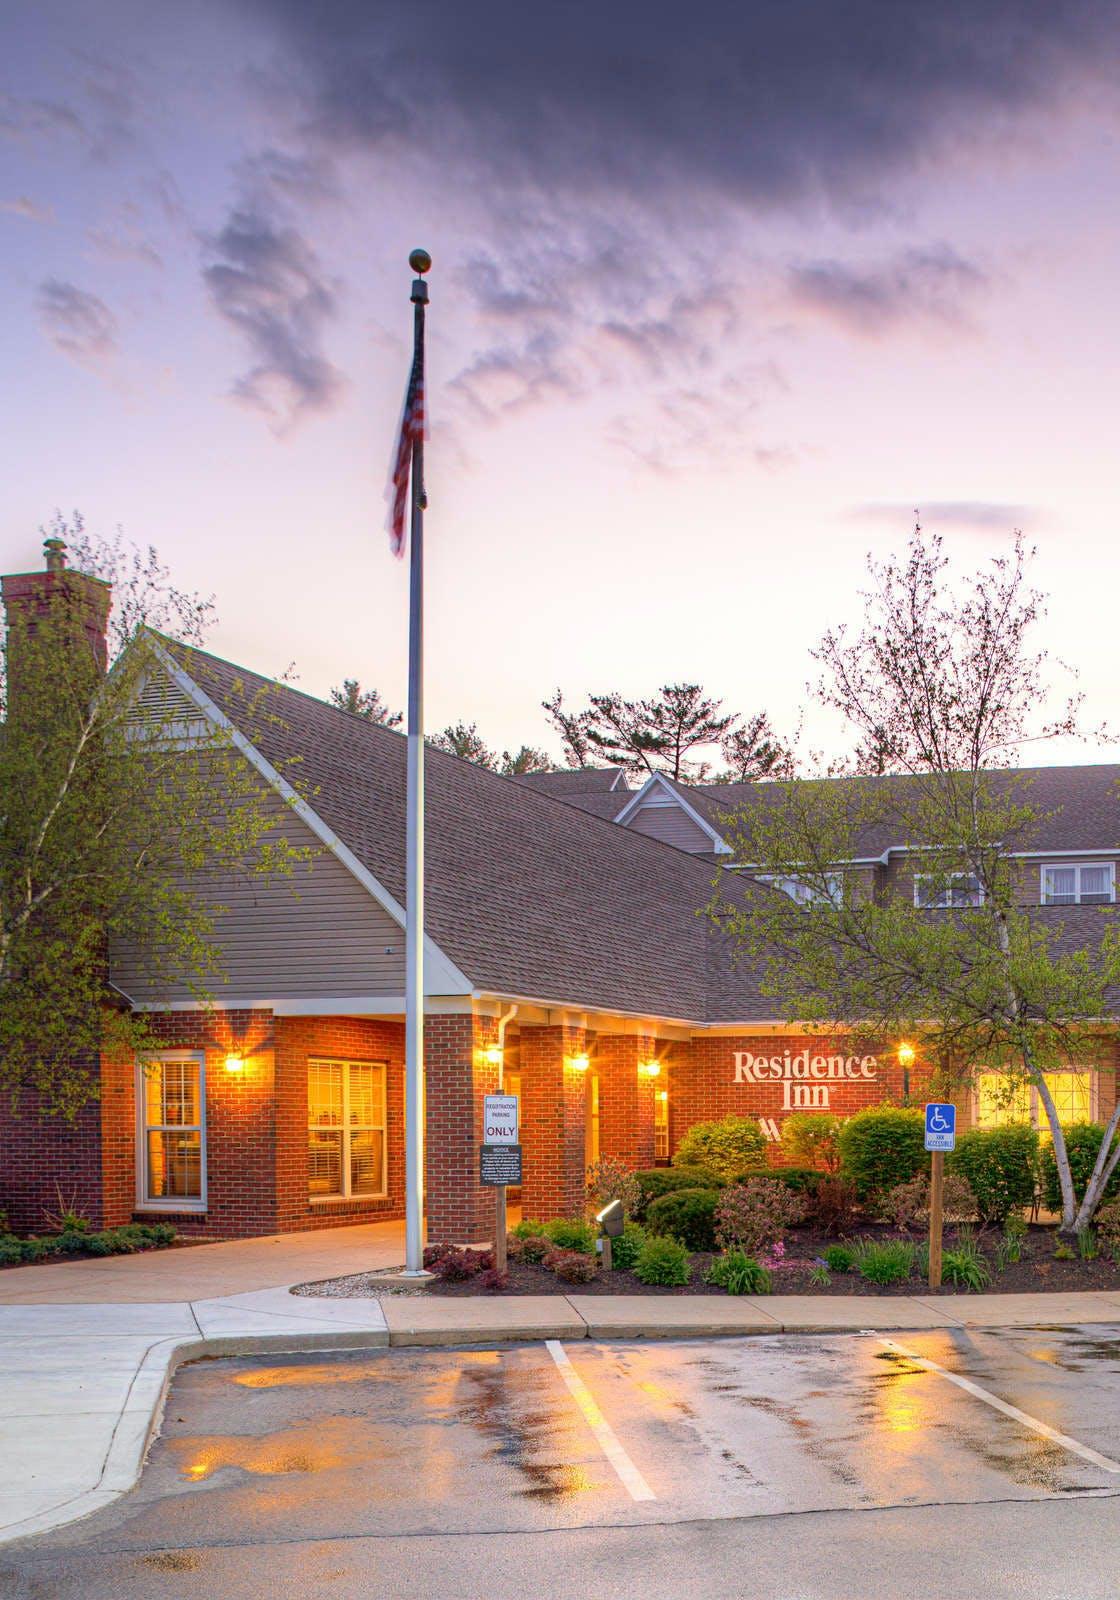 Residence Inn by Marriott Portland Scarborough